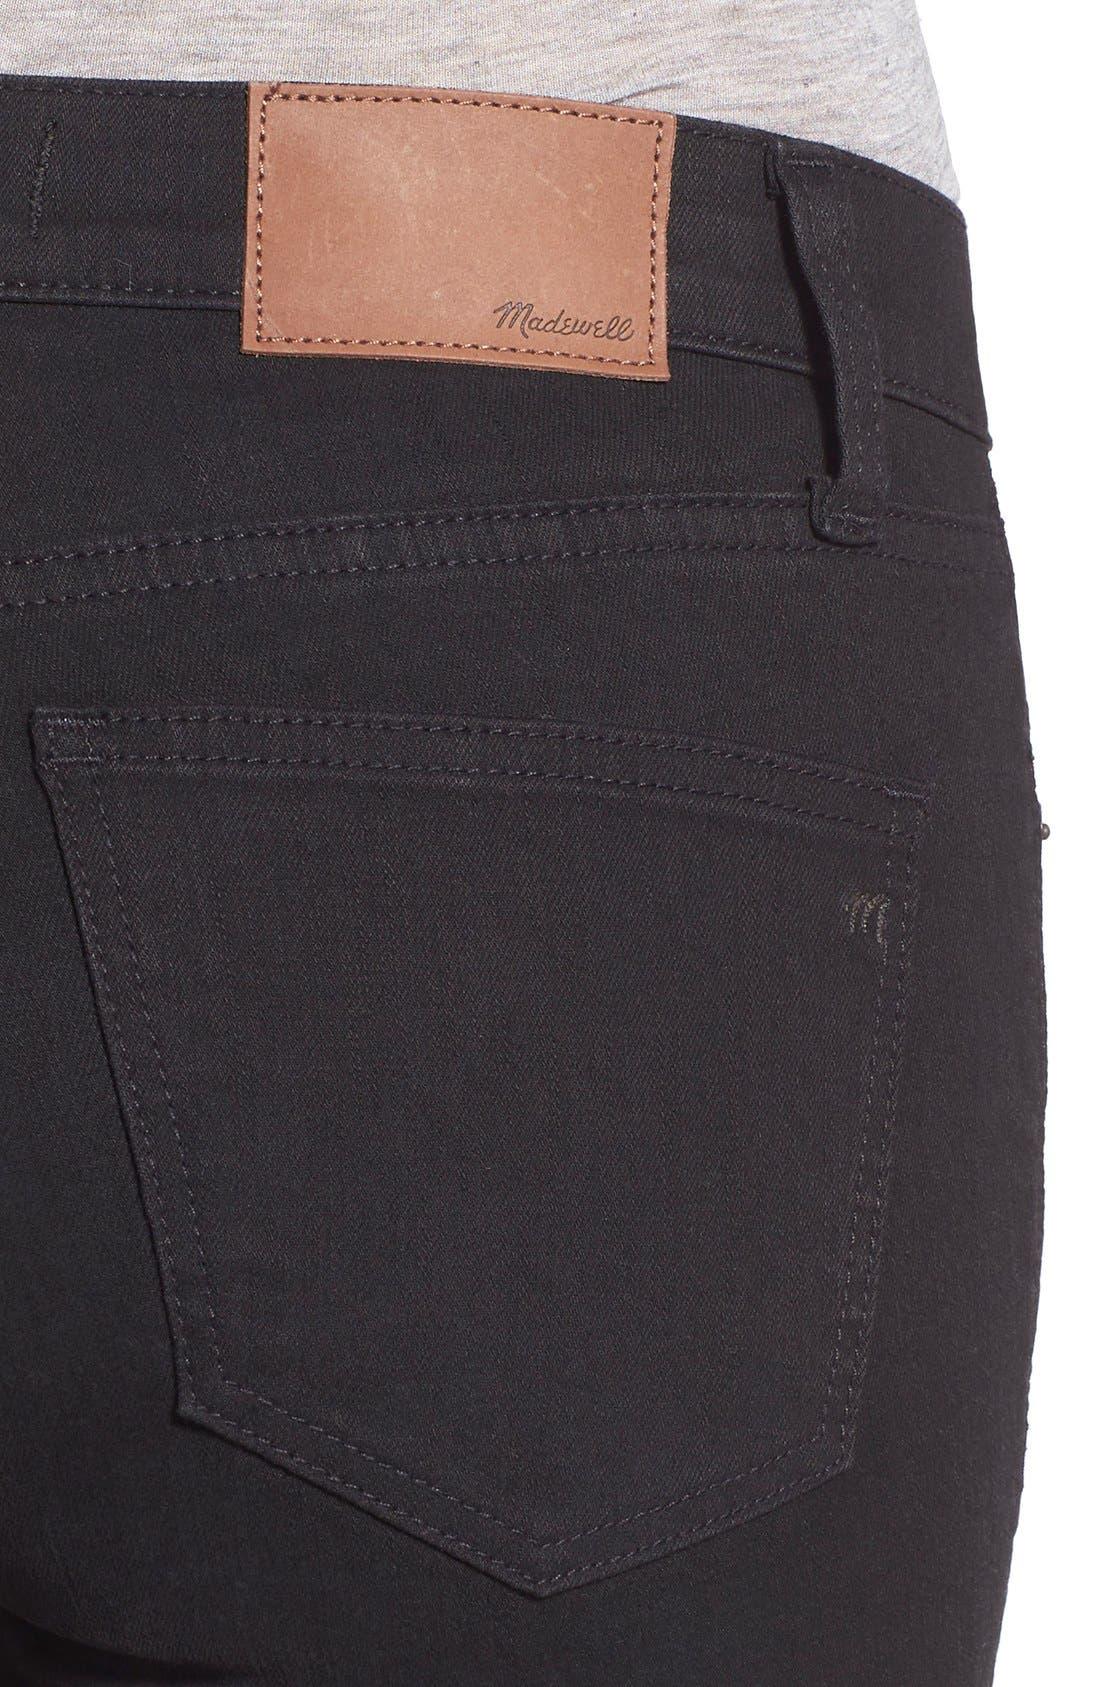 Alternate Image 4  - Madewell 'Skinny Skinny' Knee Rip Jeans (Trent Wash) (Long)